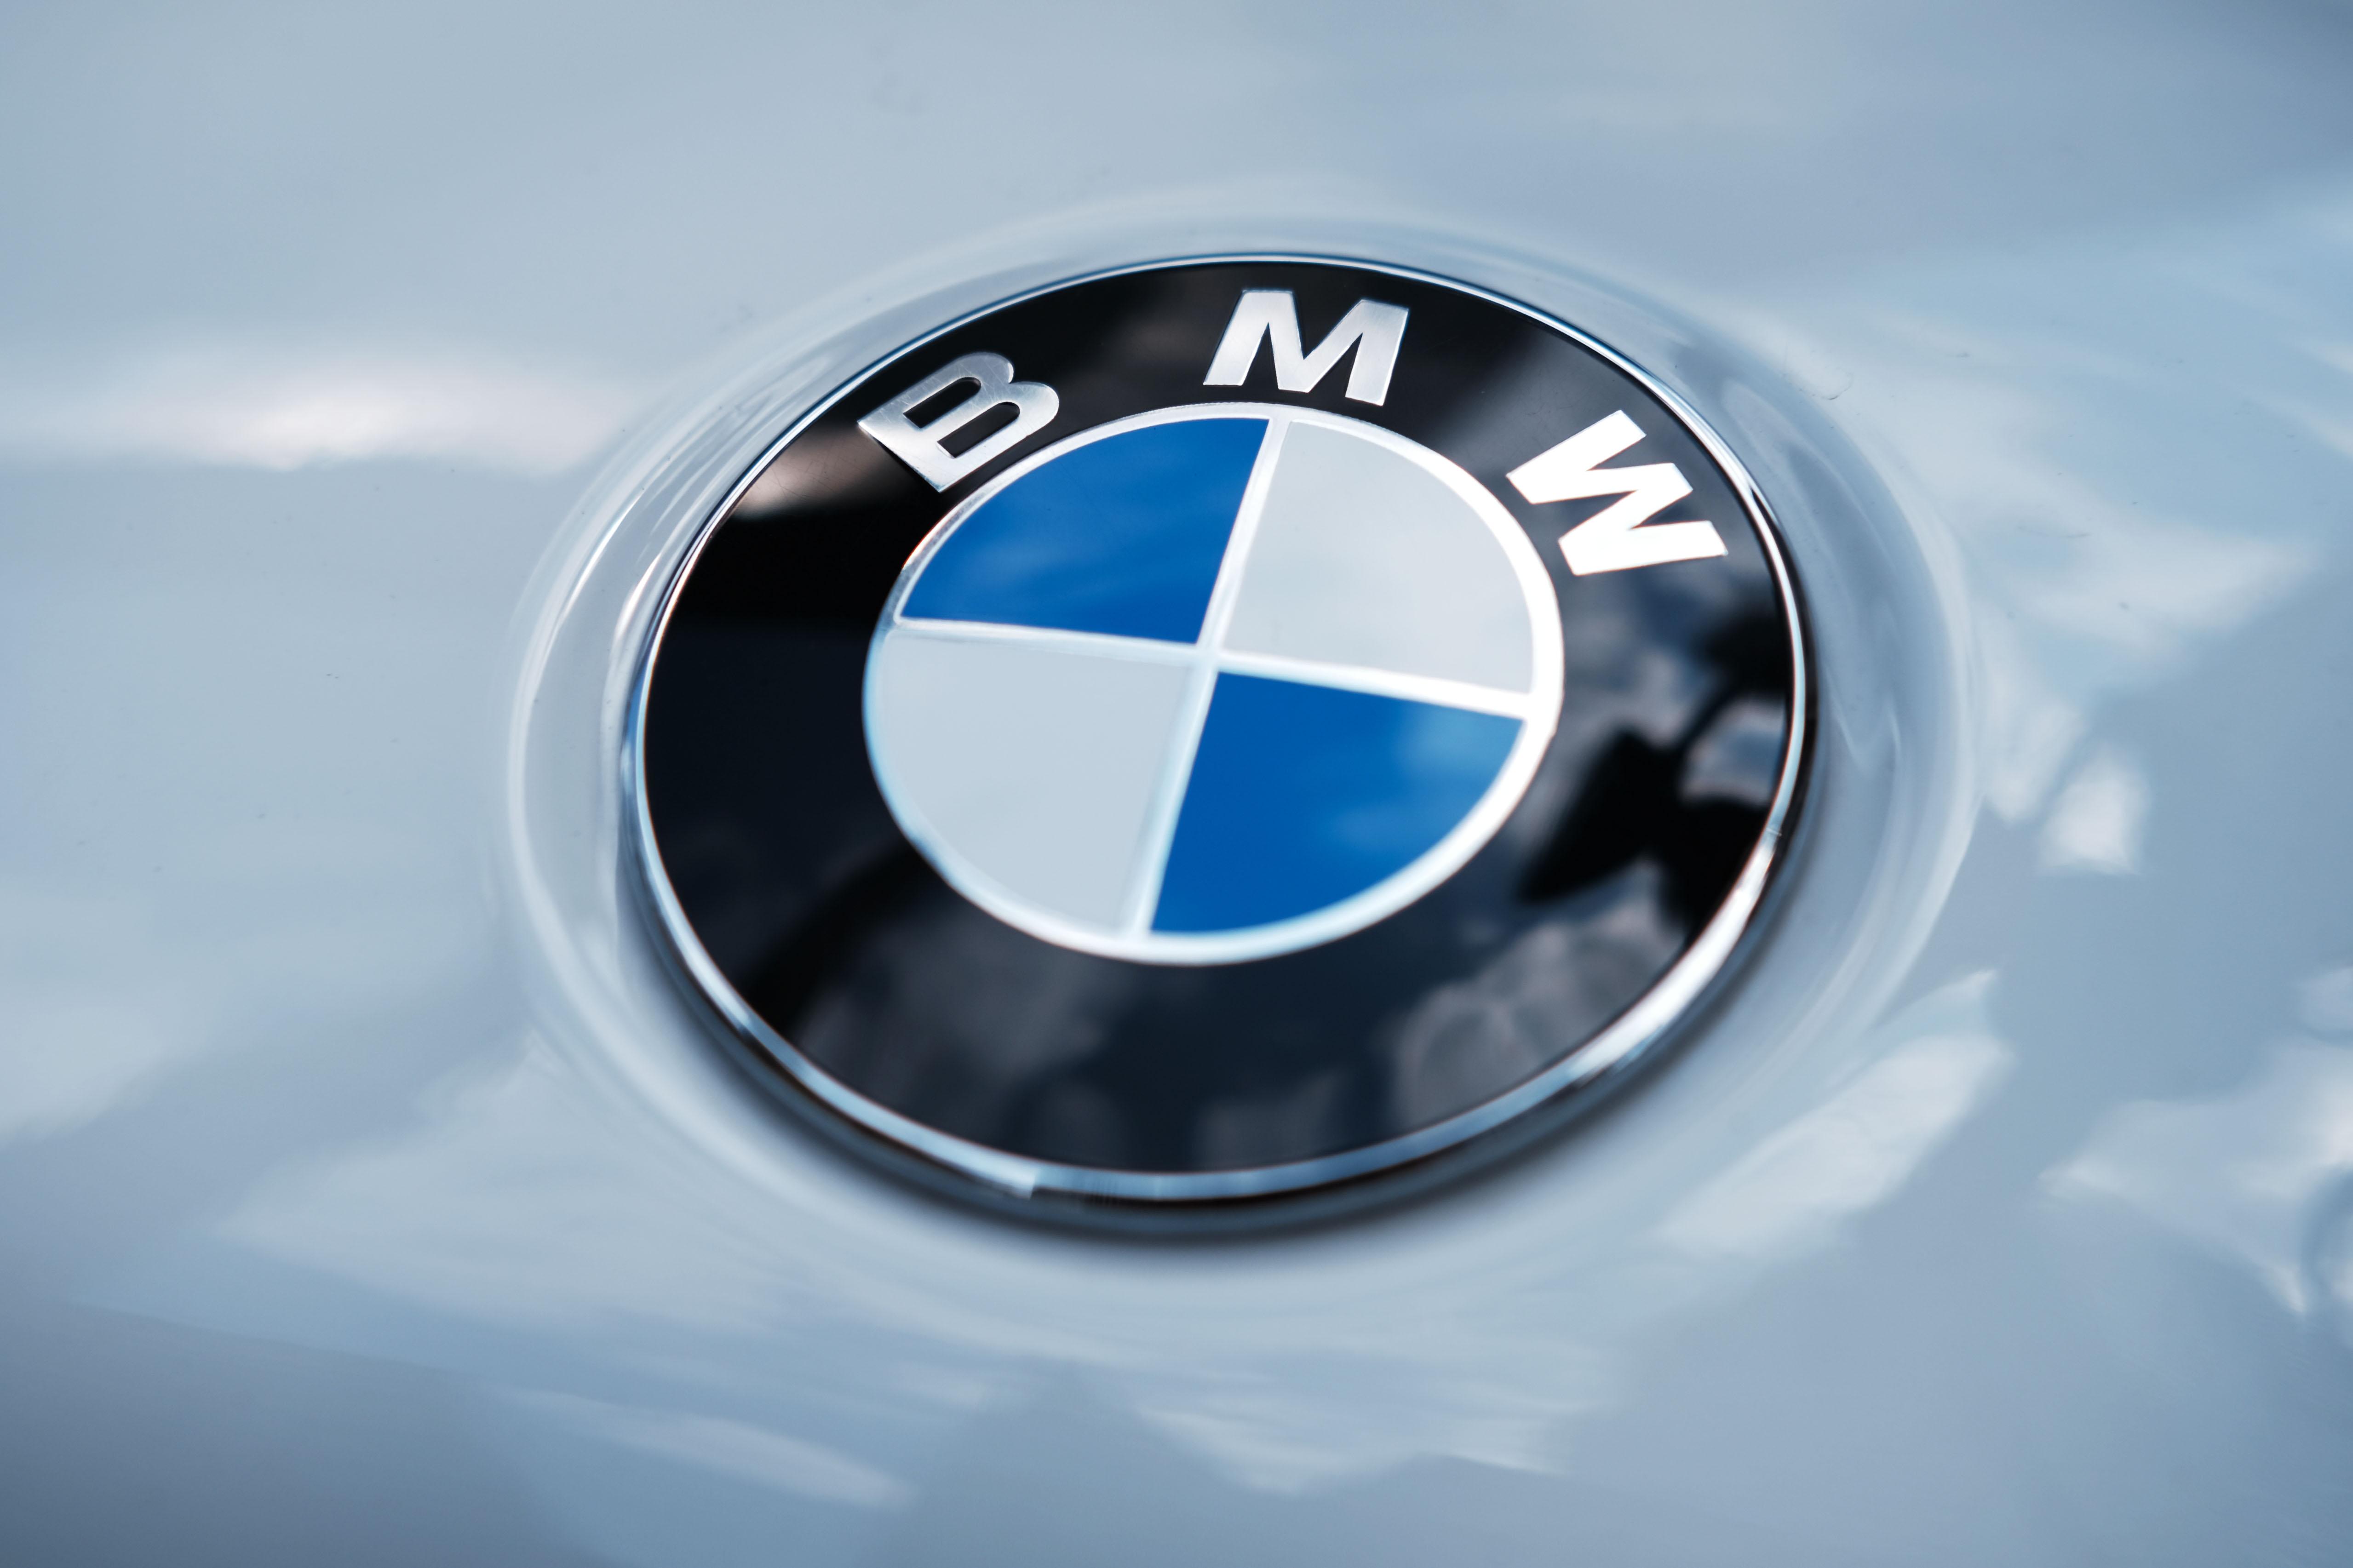 BMW Q2 Net Profit Drops 29 Percent On Higher Technology Spend